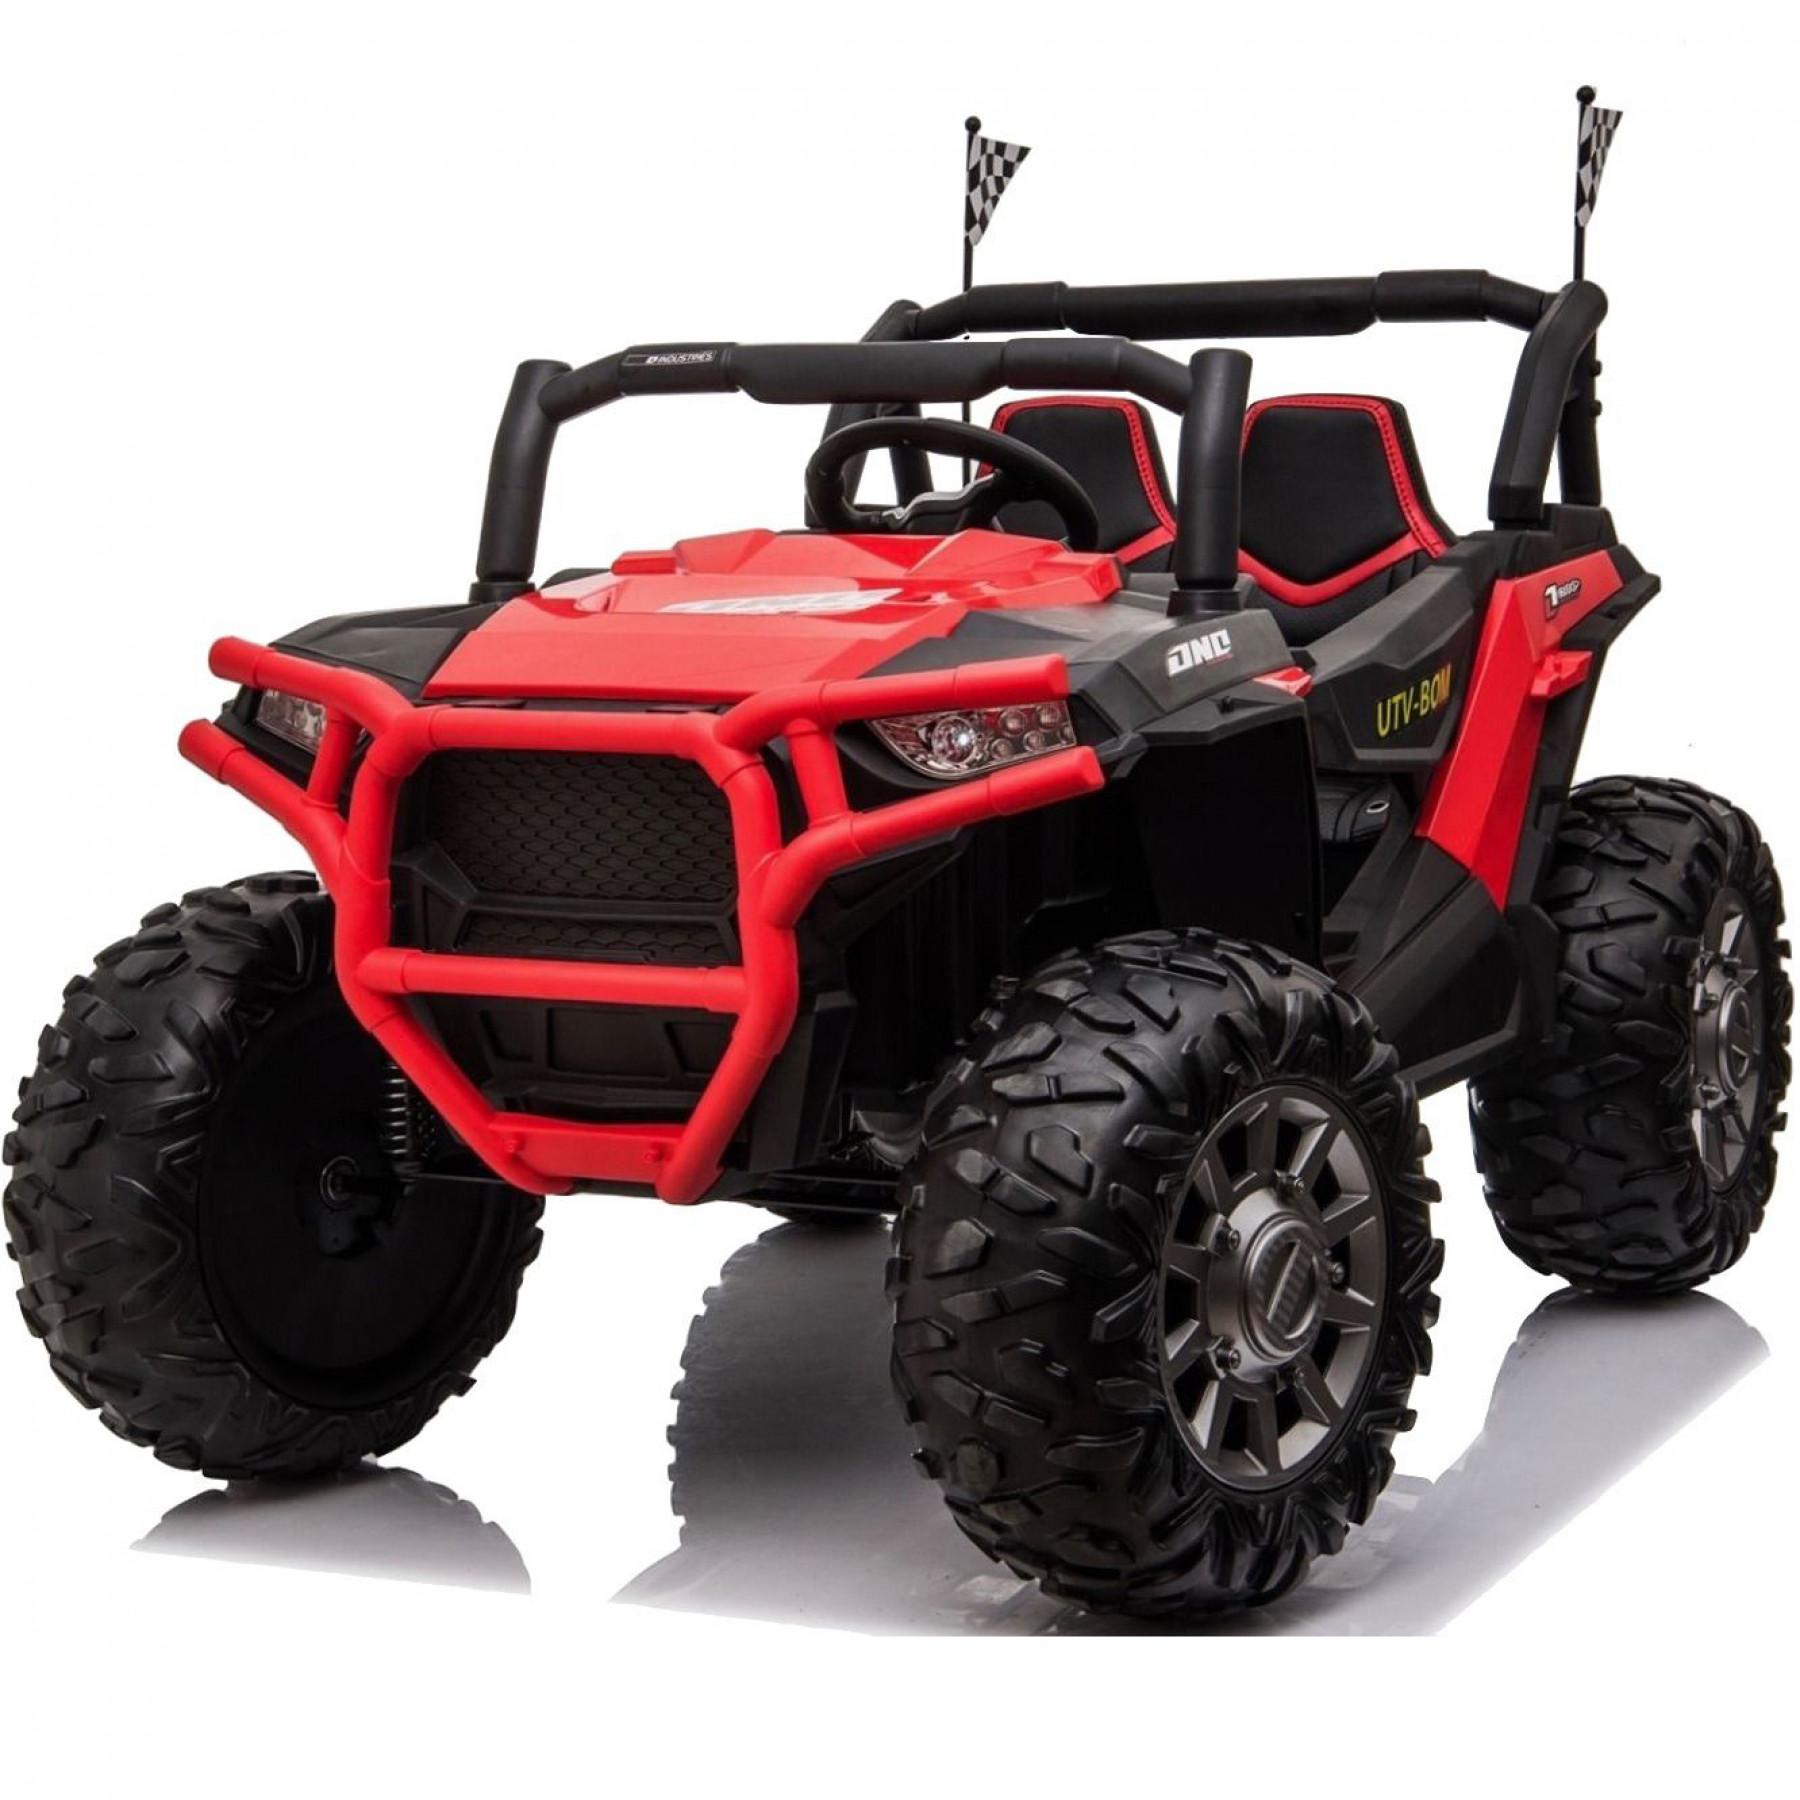 Xtreme BIG 24v Ride on Buggy Off Road UTV Jeep Red